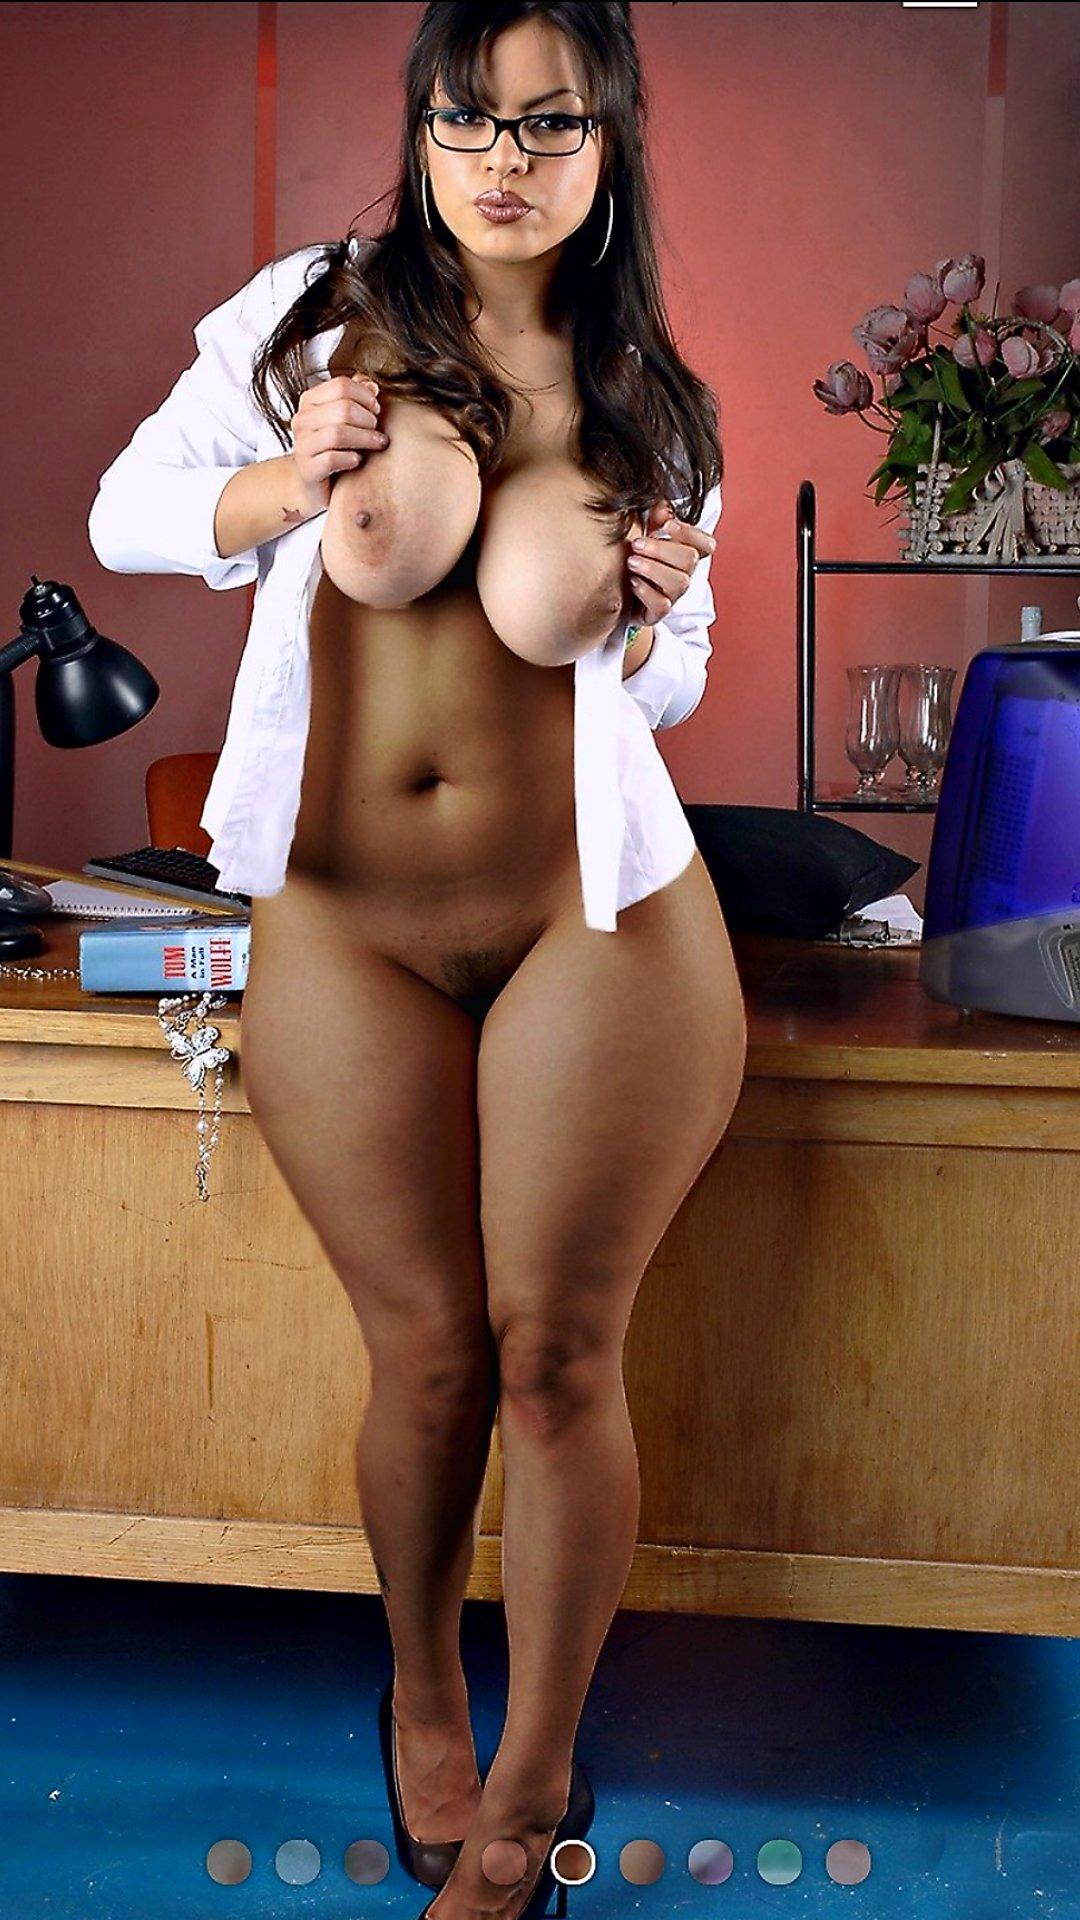 Skinny Waist Big Hips Nude Girls